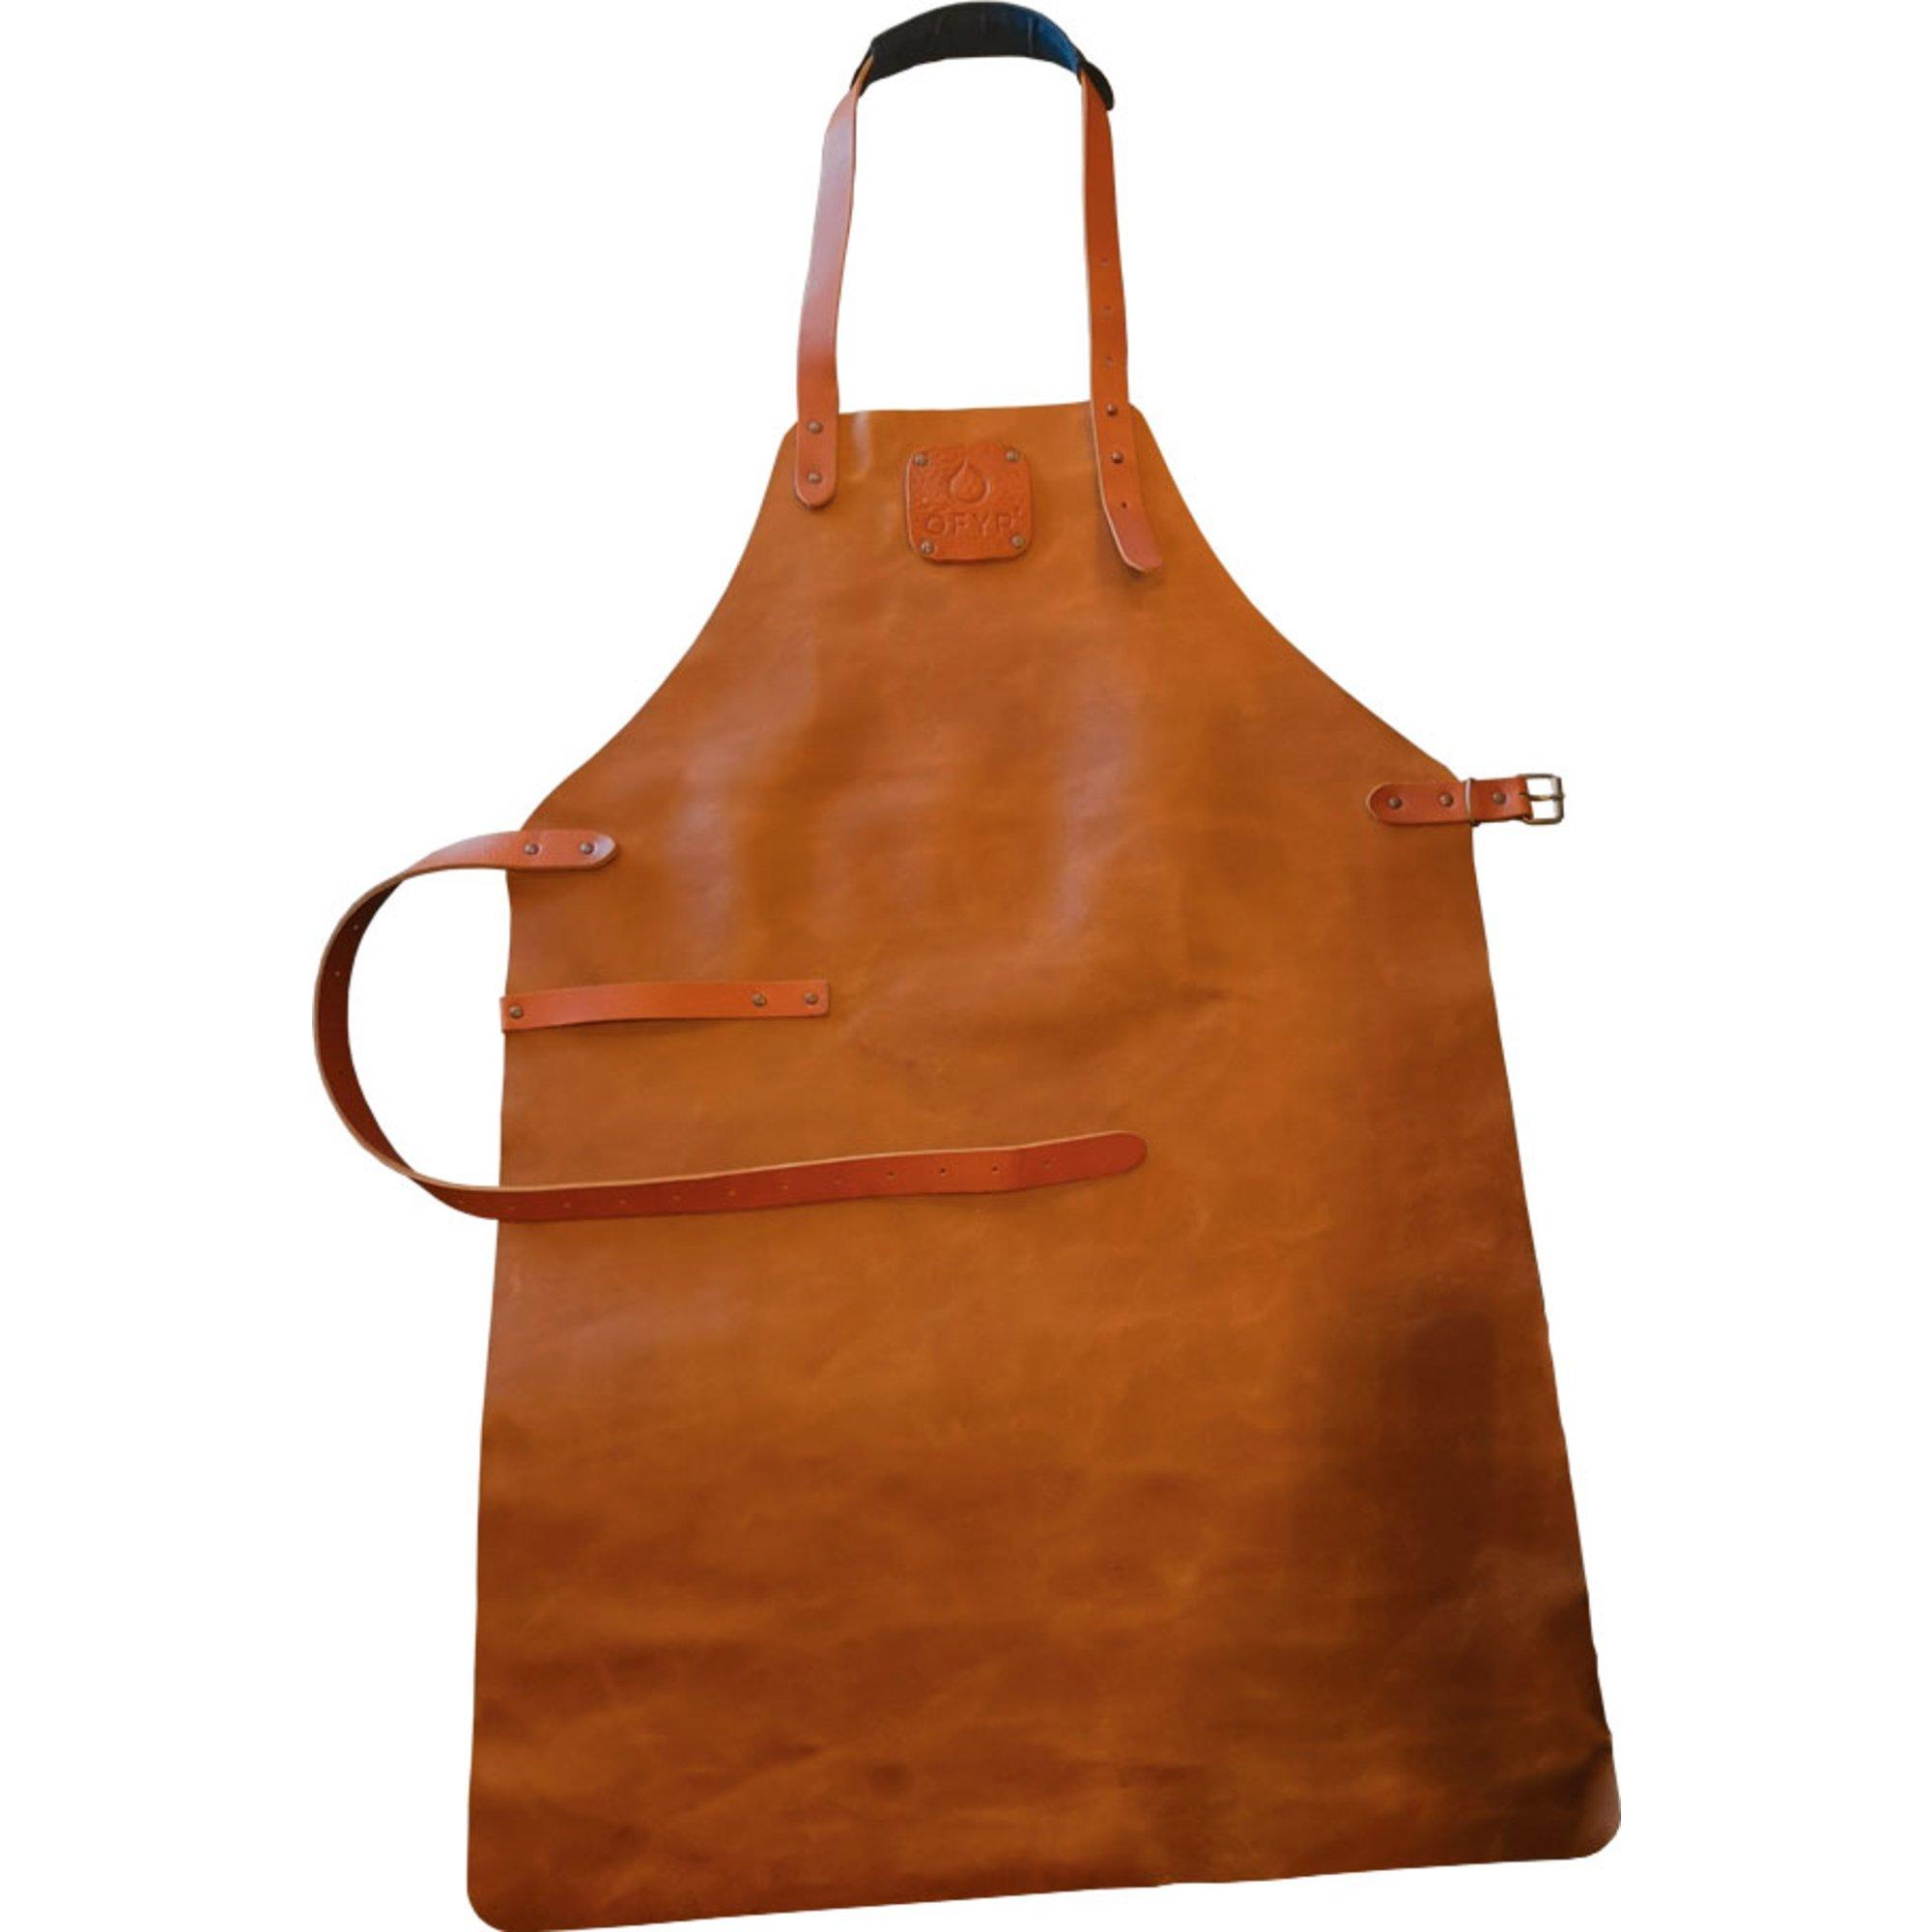 Ofyr Leather Apron